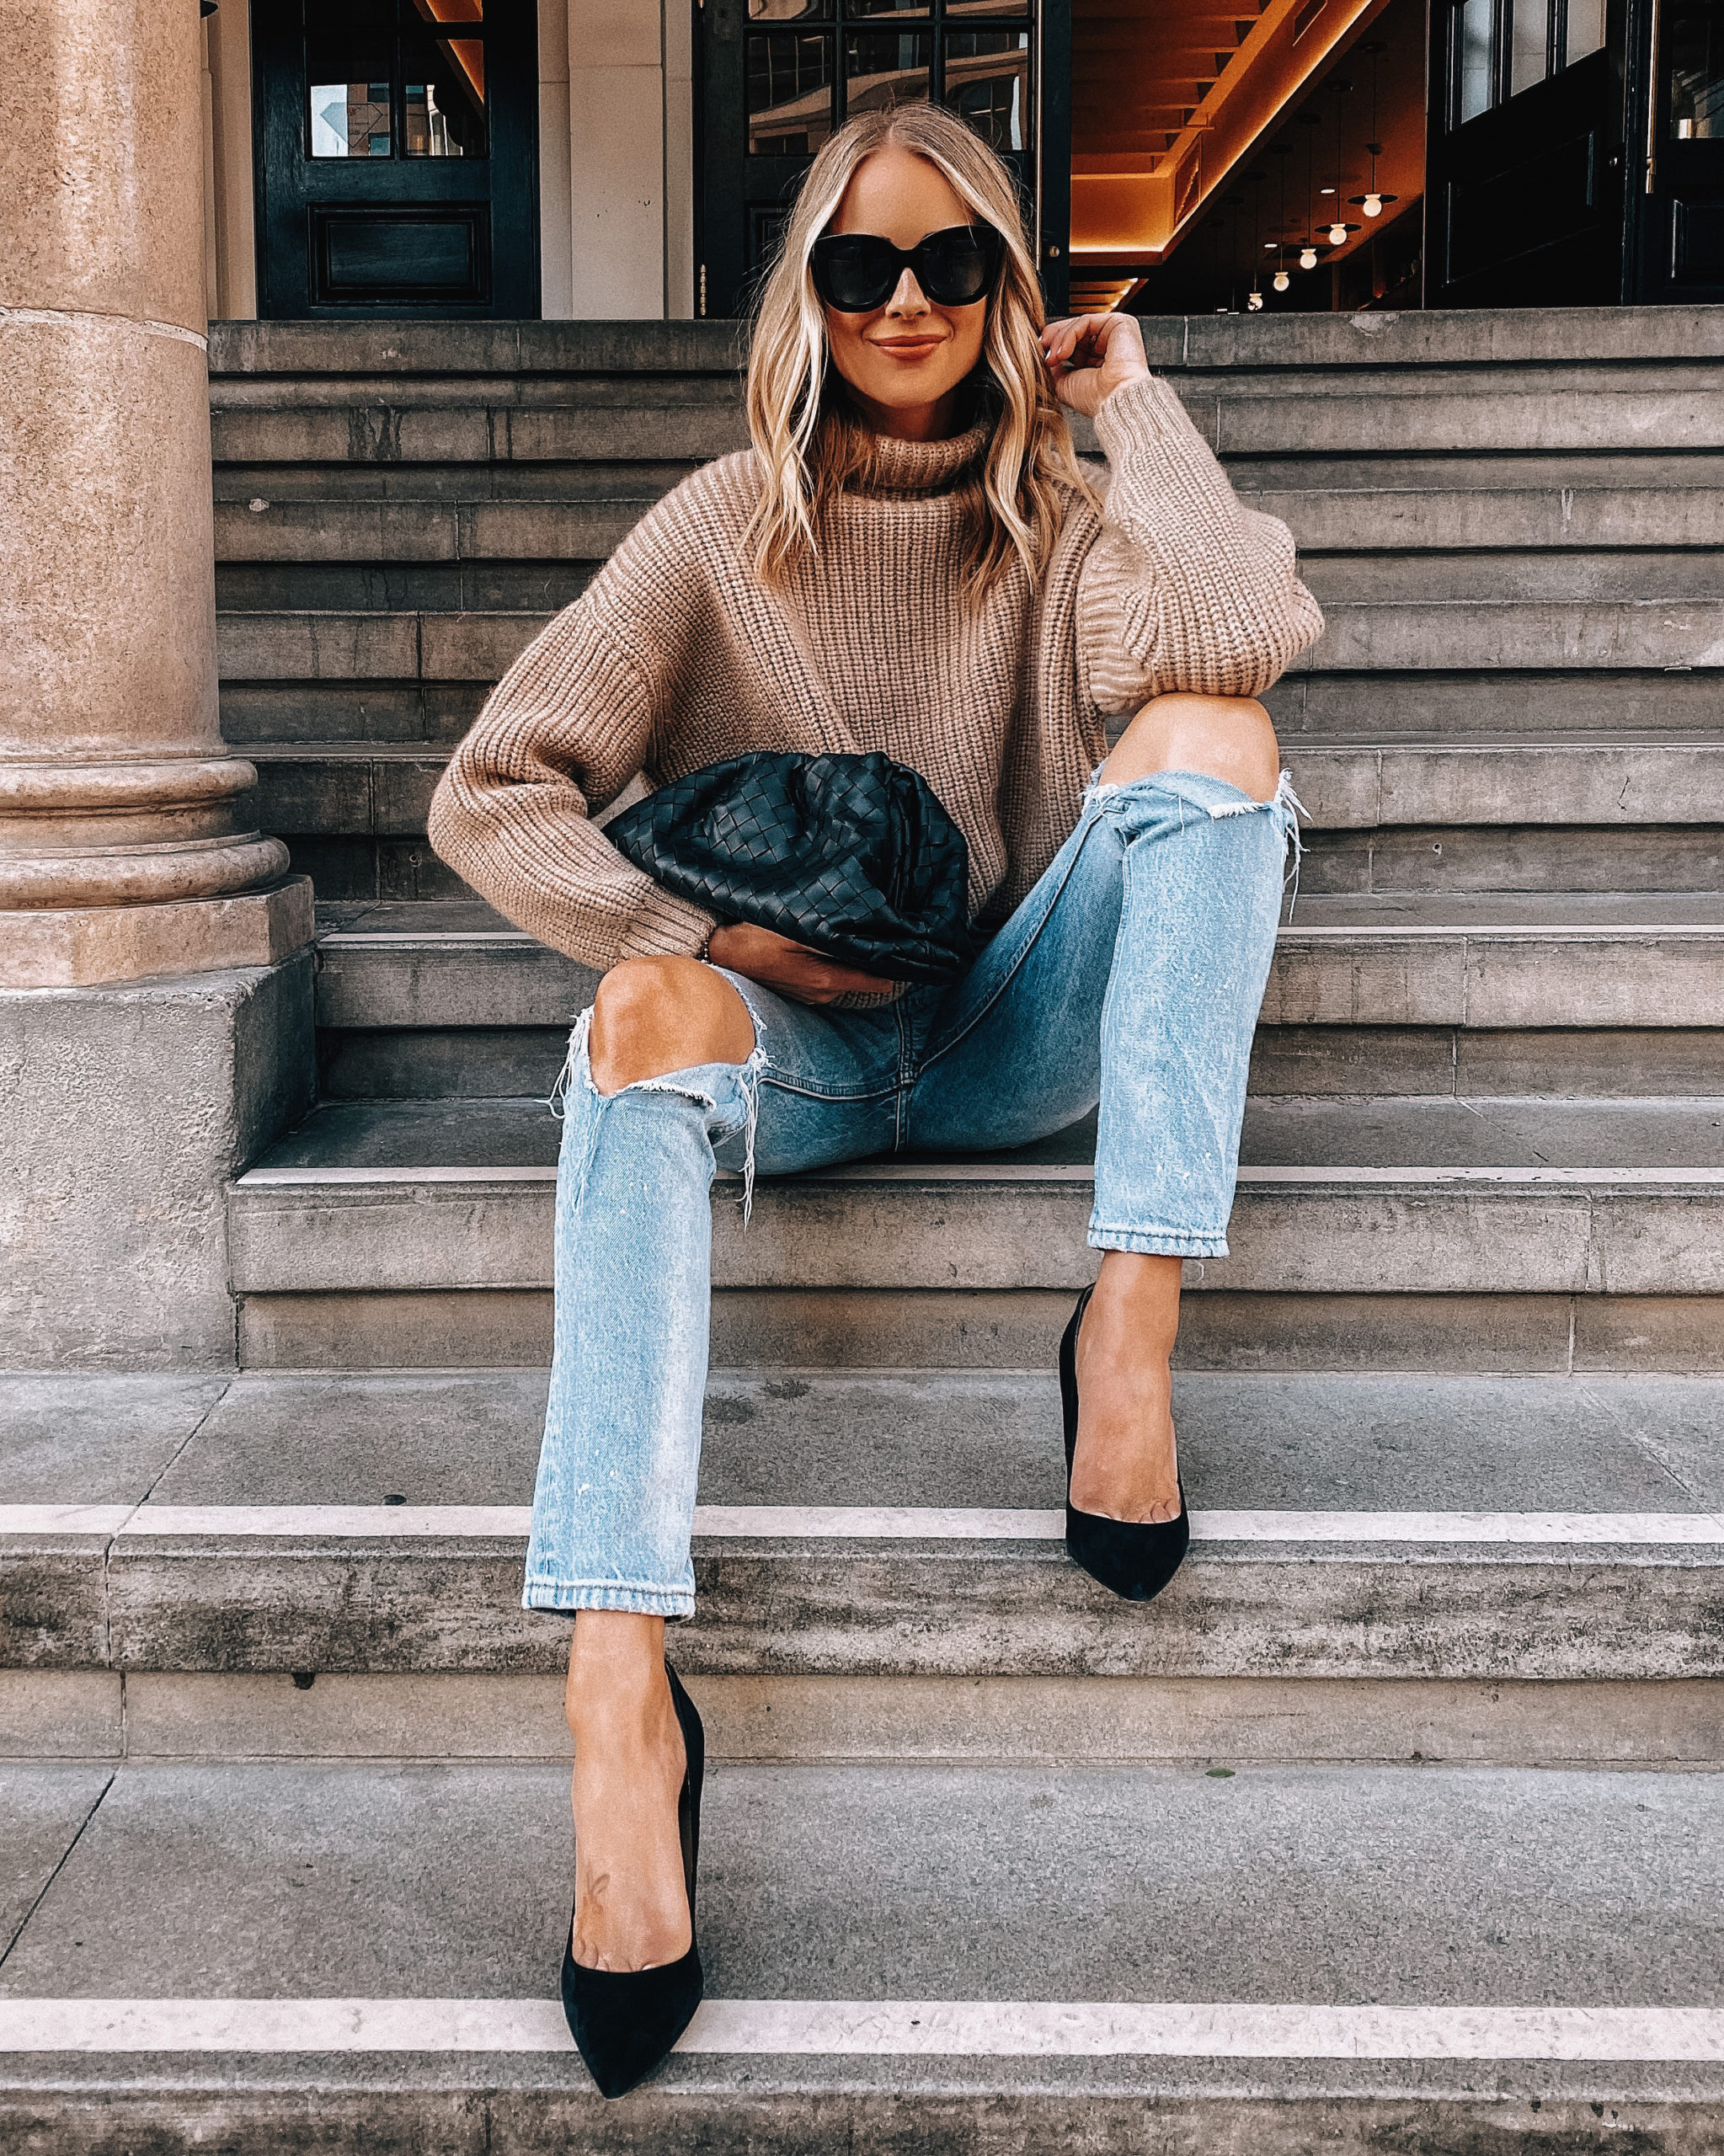 Fashion Jackson Wearing Oversized Tan Sweater Ripped Jeans Black Pumps Bottega Venta Black Clutch